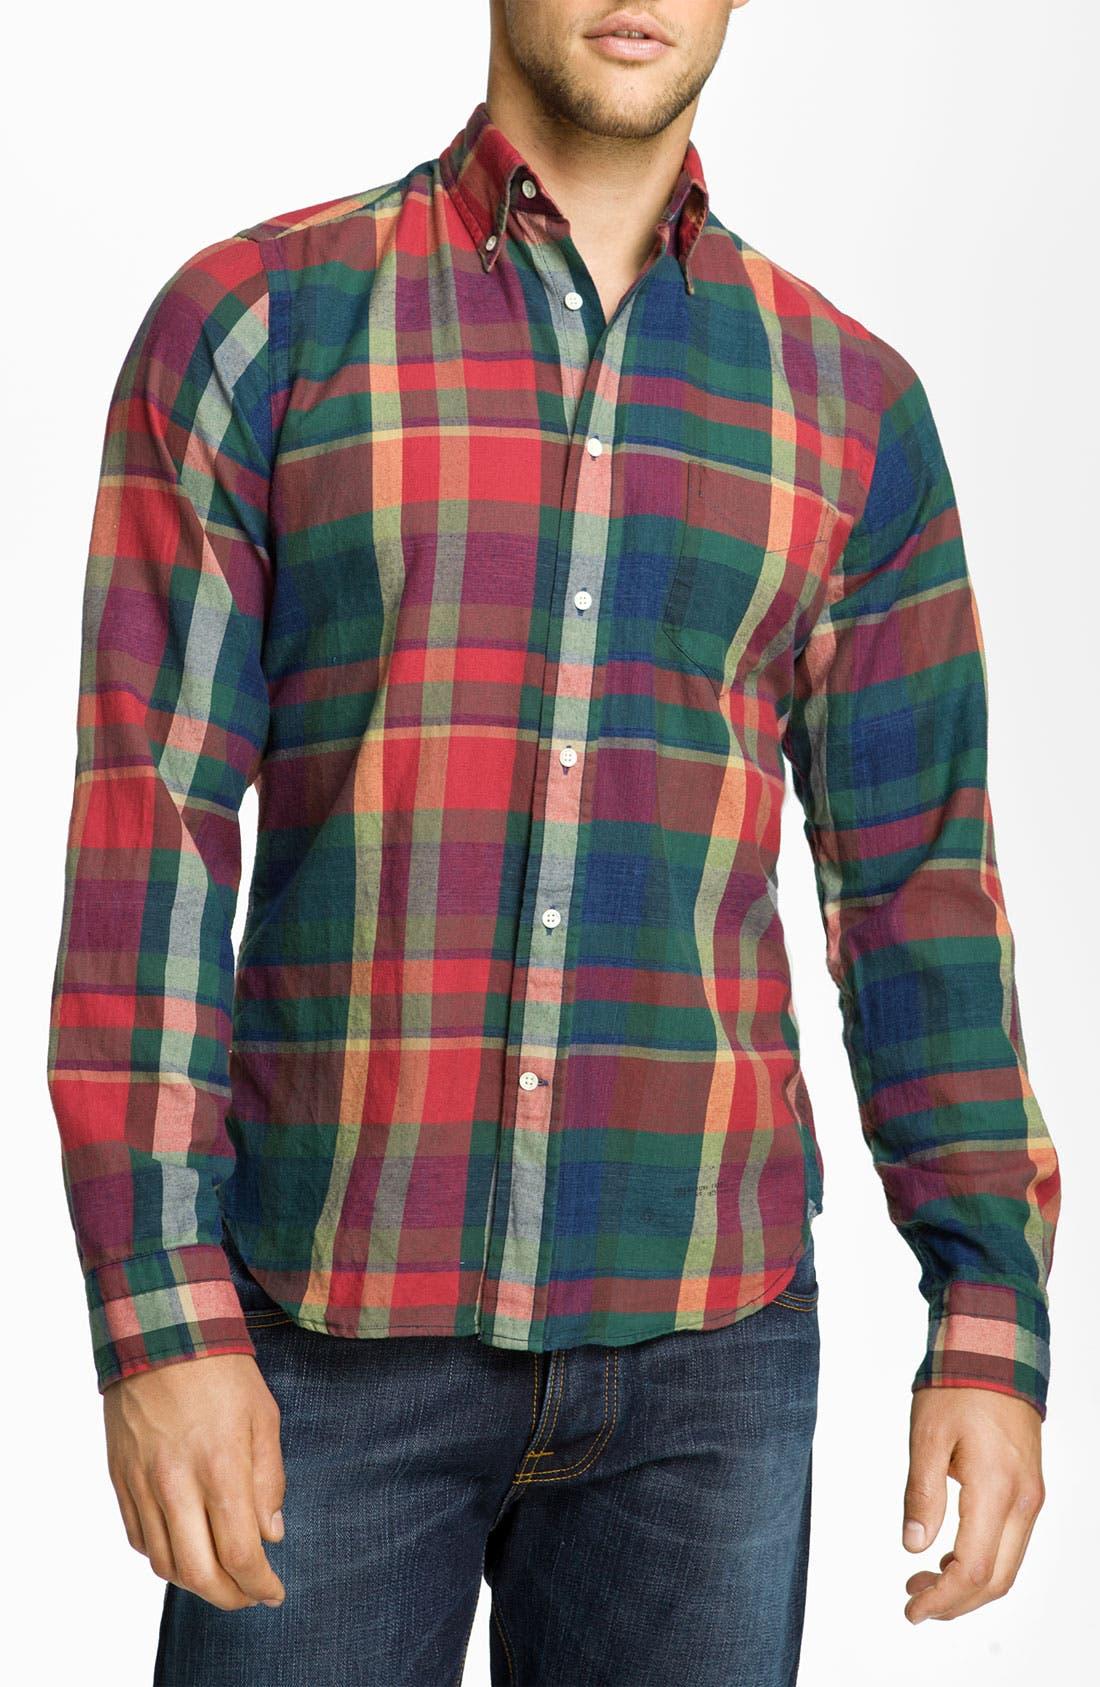 Main Image - Gant Rugger 'Indigo' Plaid Woven Shirt